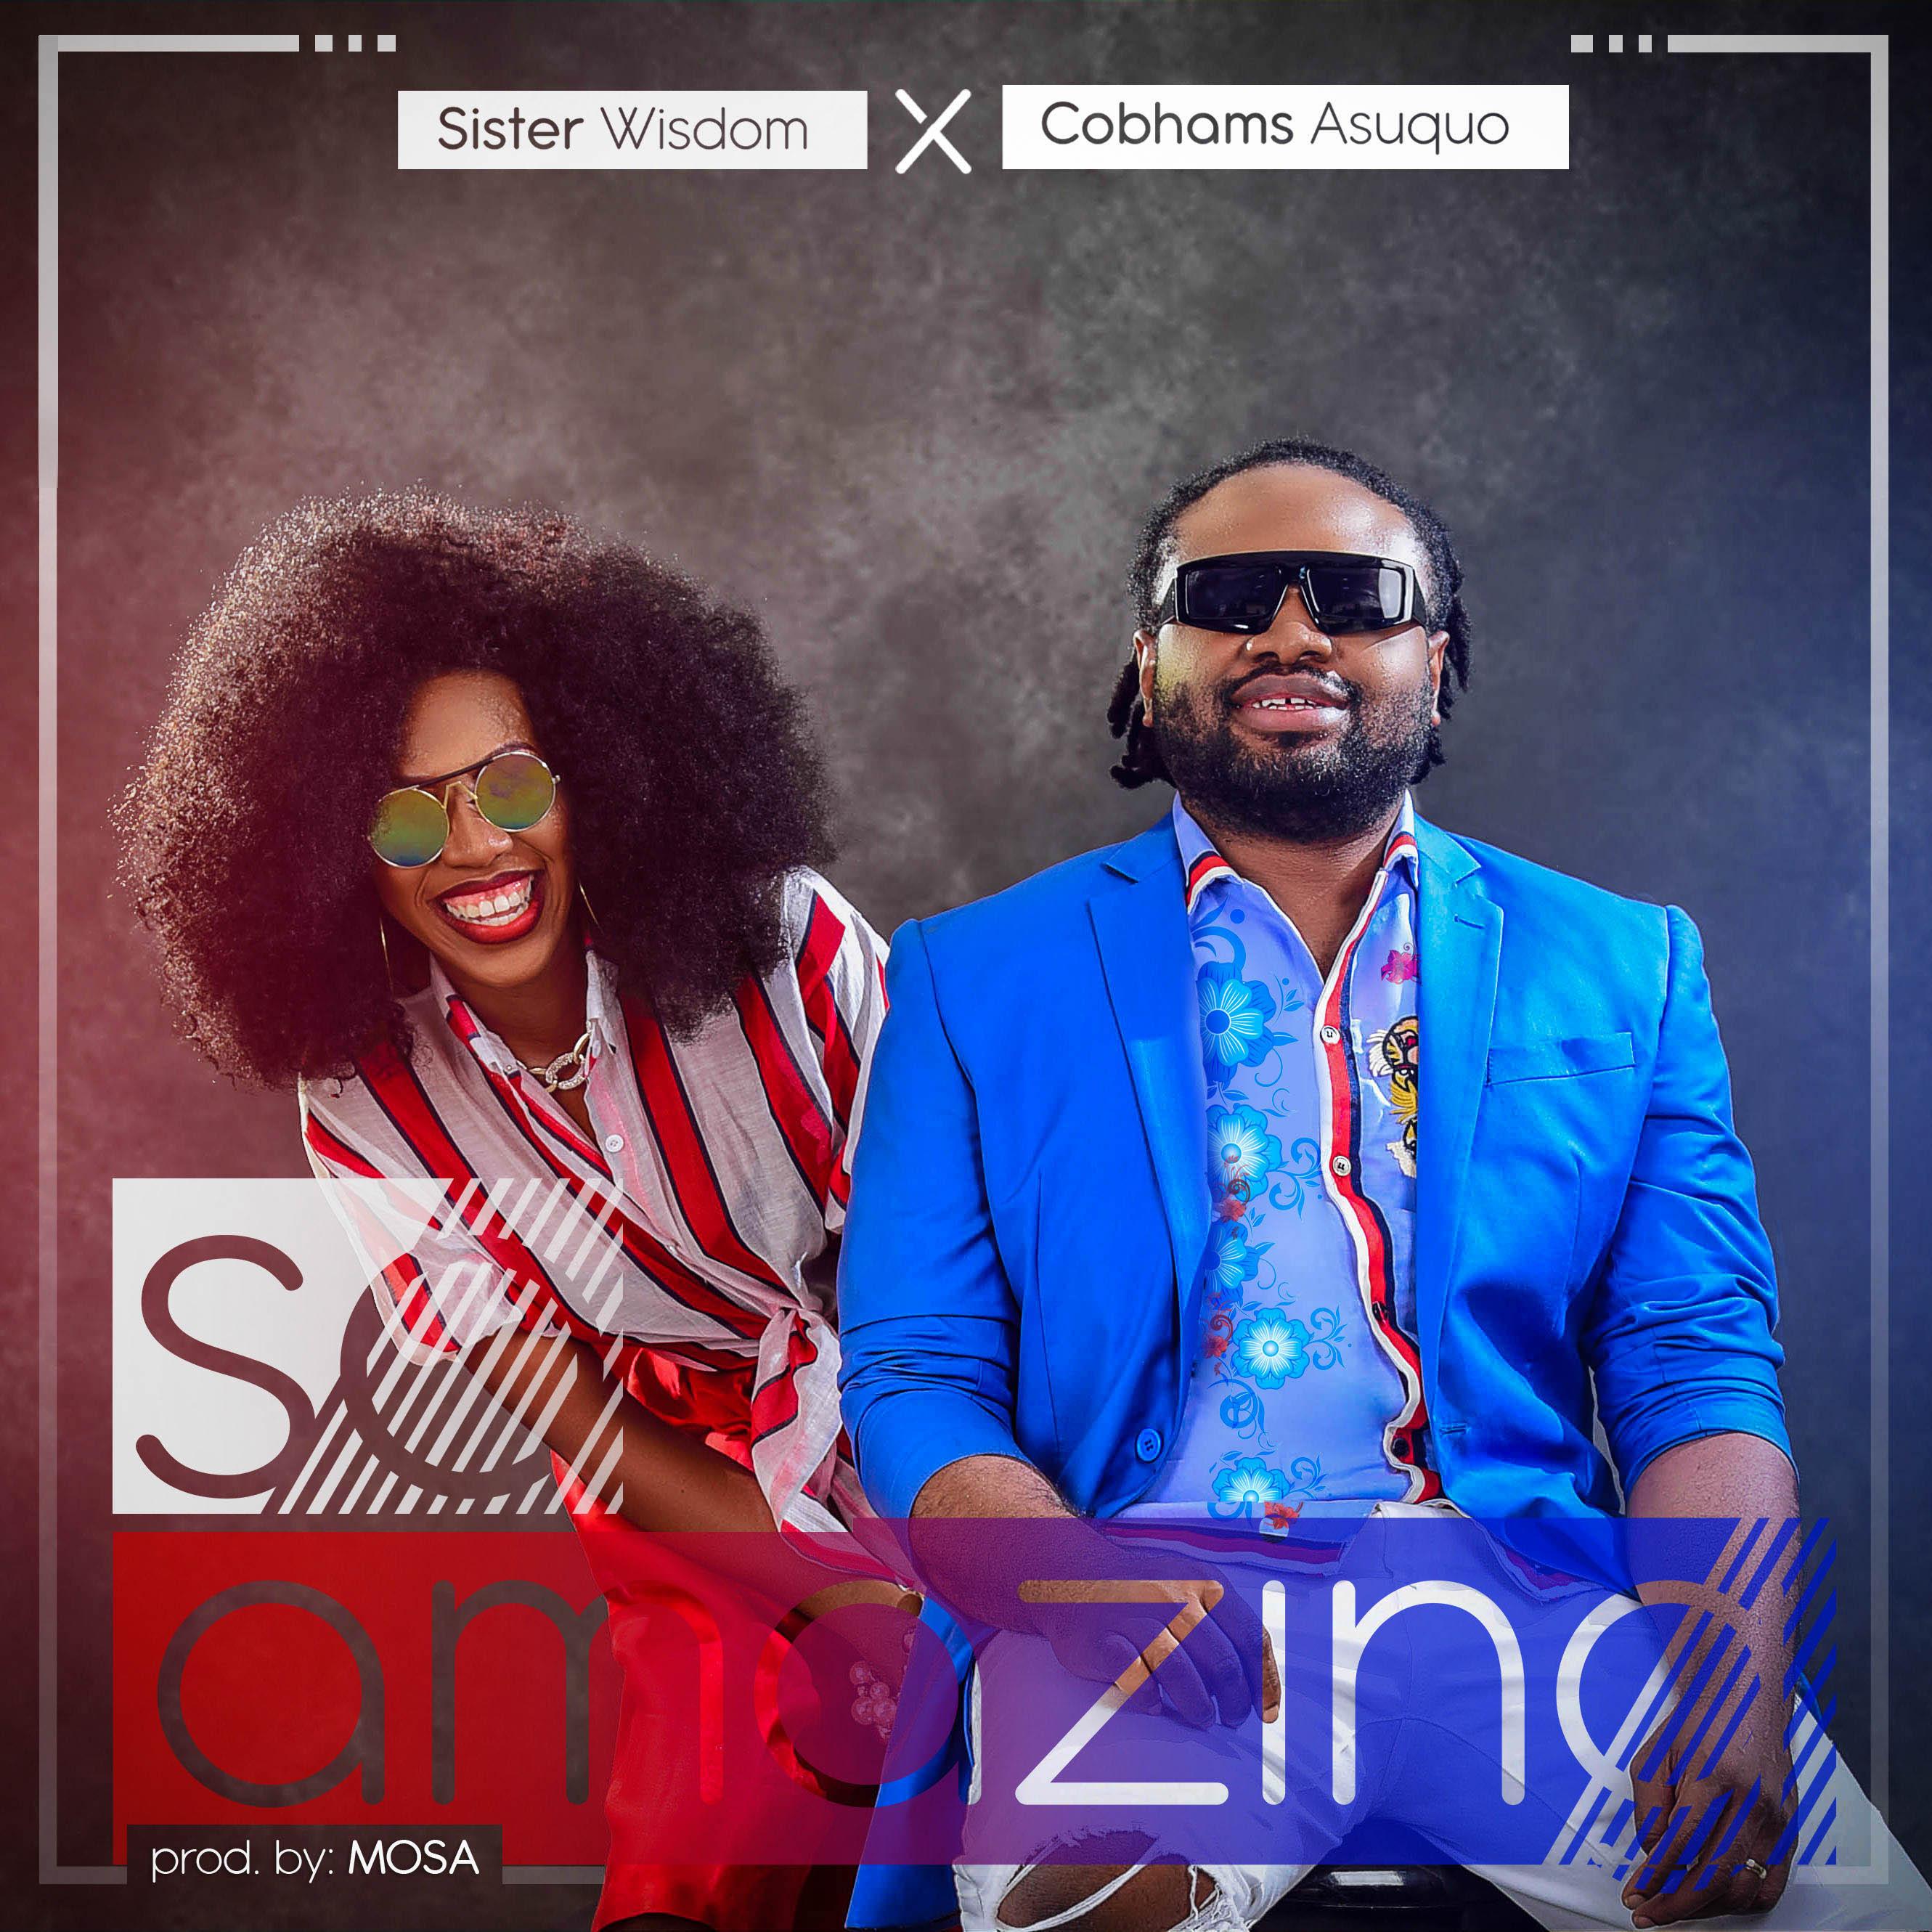 Sister Wisdom - So Amazing ft. Cobhams Asuquo Mp3